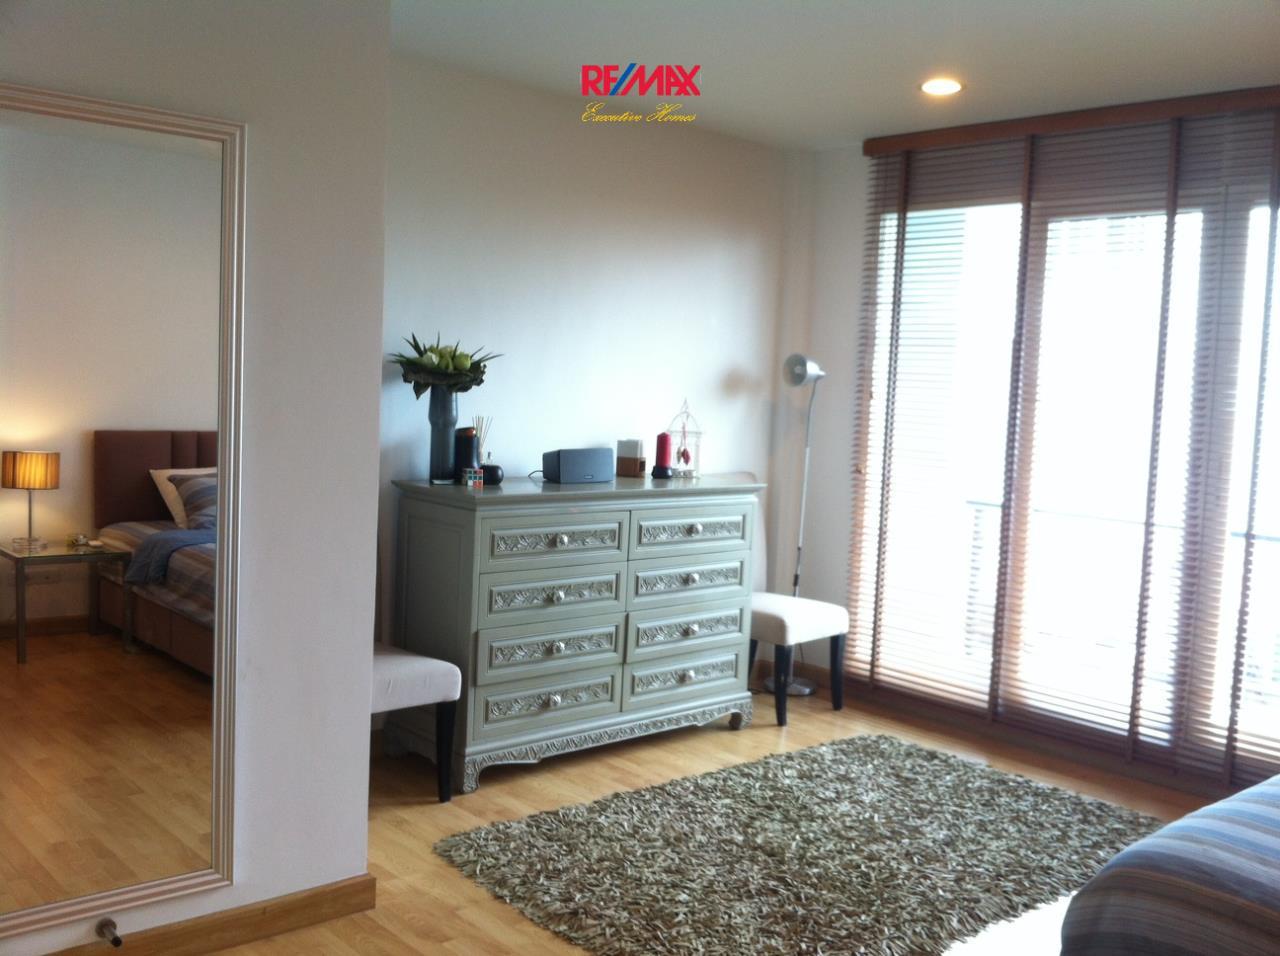 RE/MAX Executive Homes Agency's Nice 3 Bedroom Townhouse for Sale Baan Klang Muang s-sense Rama 9 - Ladprao 4